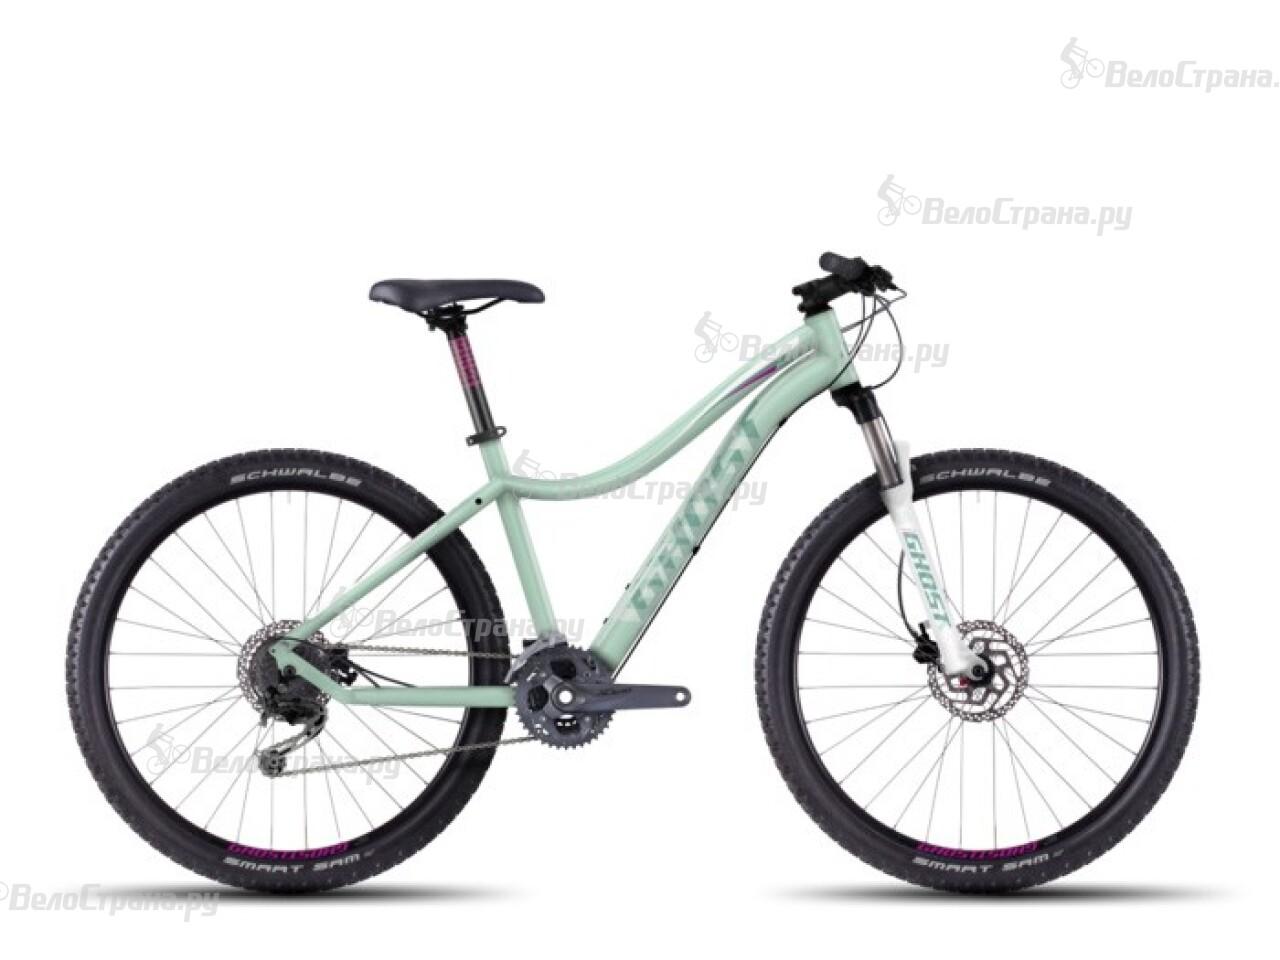 Велосипед Ghost Lanao 4 (2016) велосипед ghost lanao 3 2015